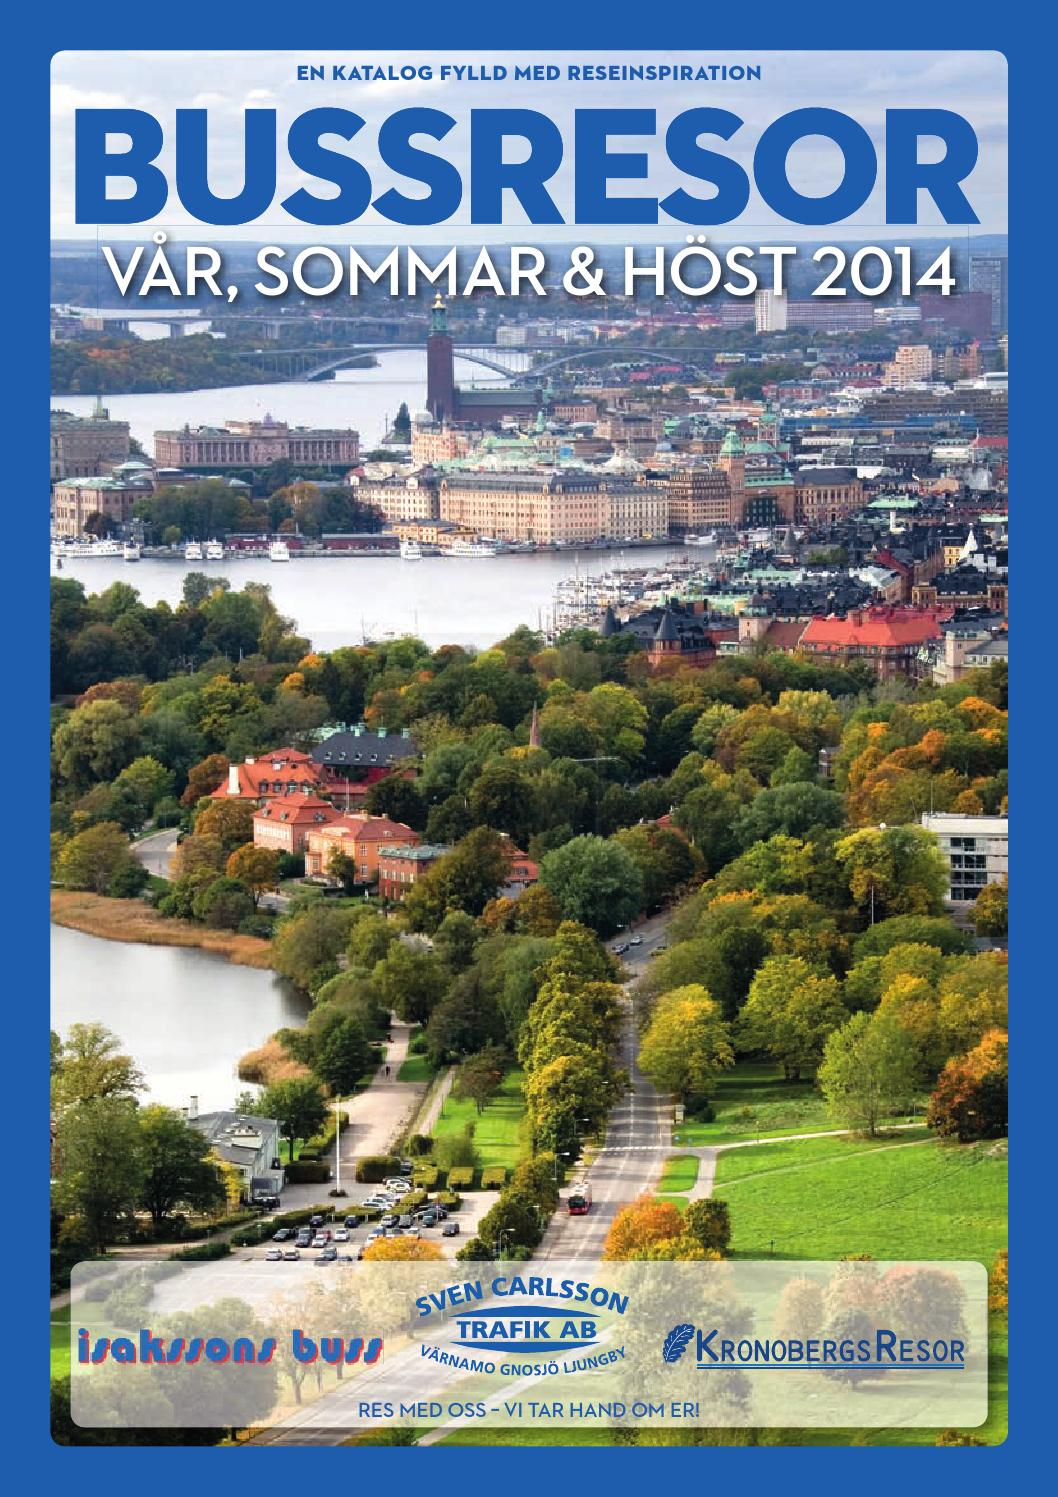 Bussresor Isaksson 2014 by Brun Mediaproduktion AB - issuu ed28eea4b0794